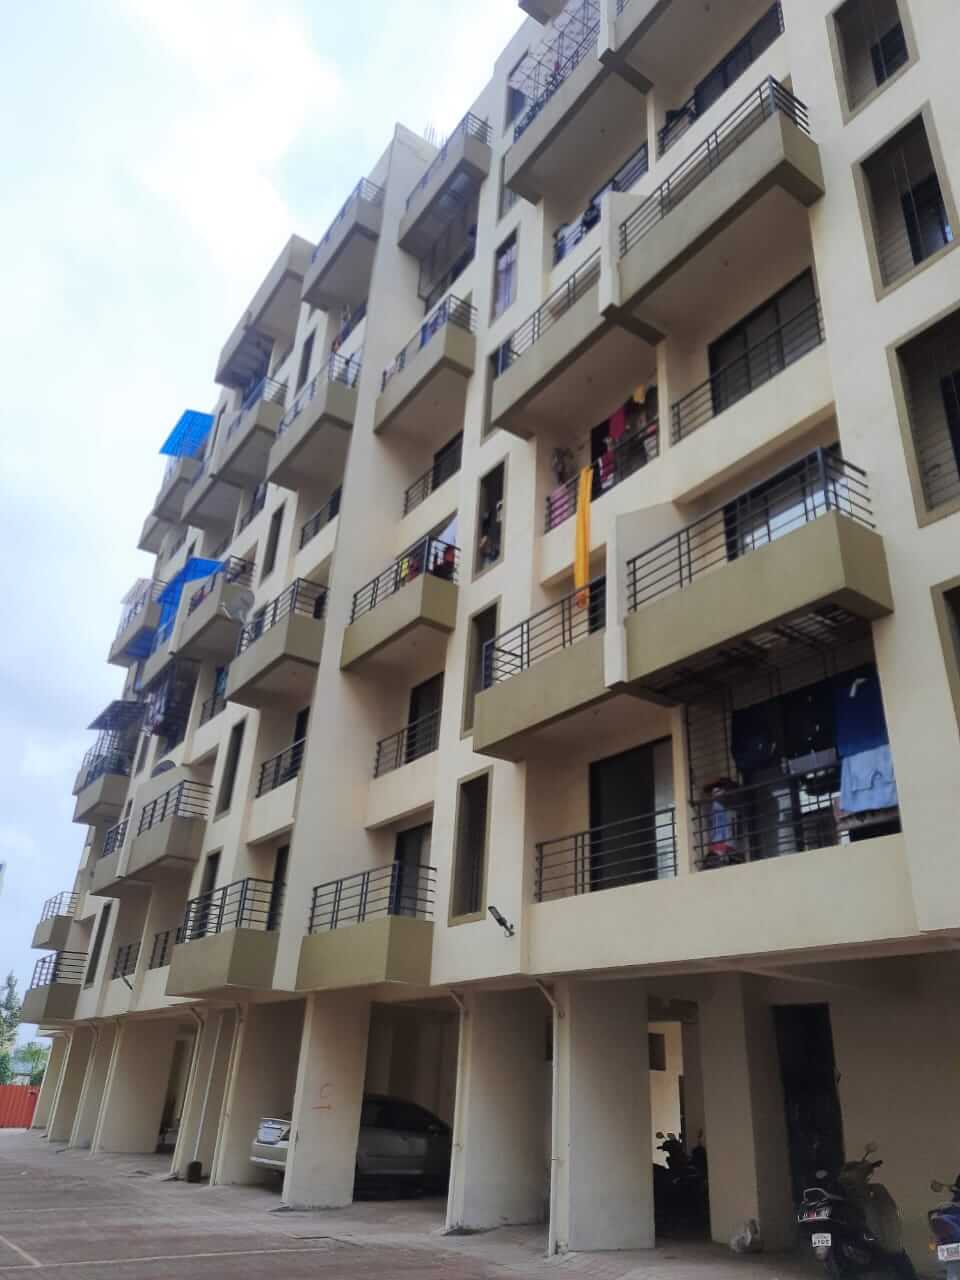 1 BHK Apartment / Flat for Sale 625 Sq. Feet at Mumbai, Virar